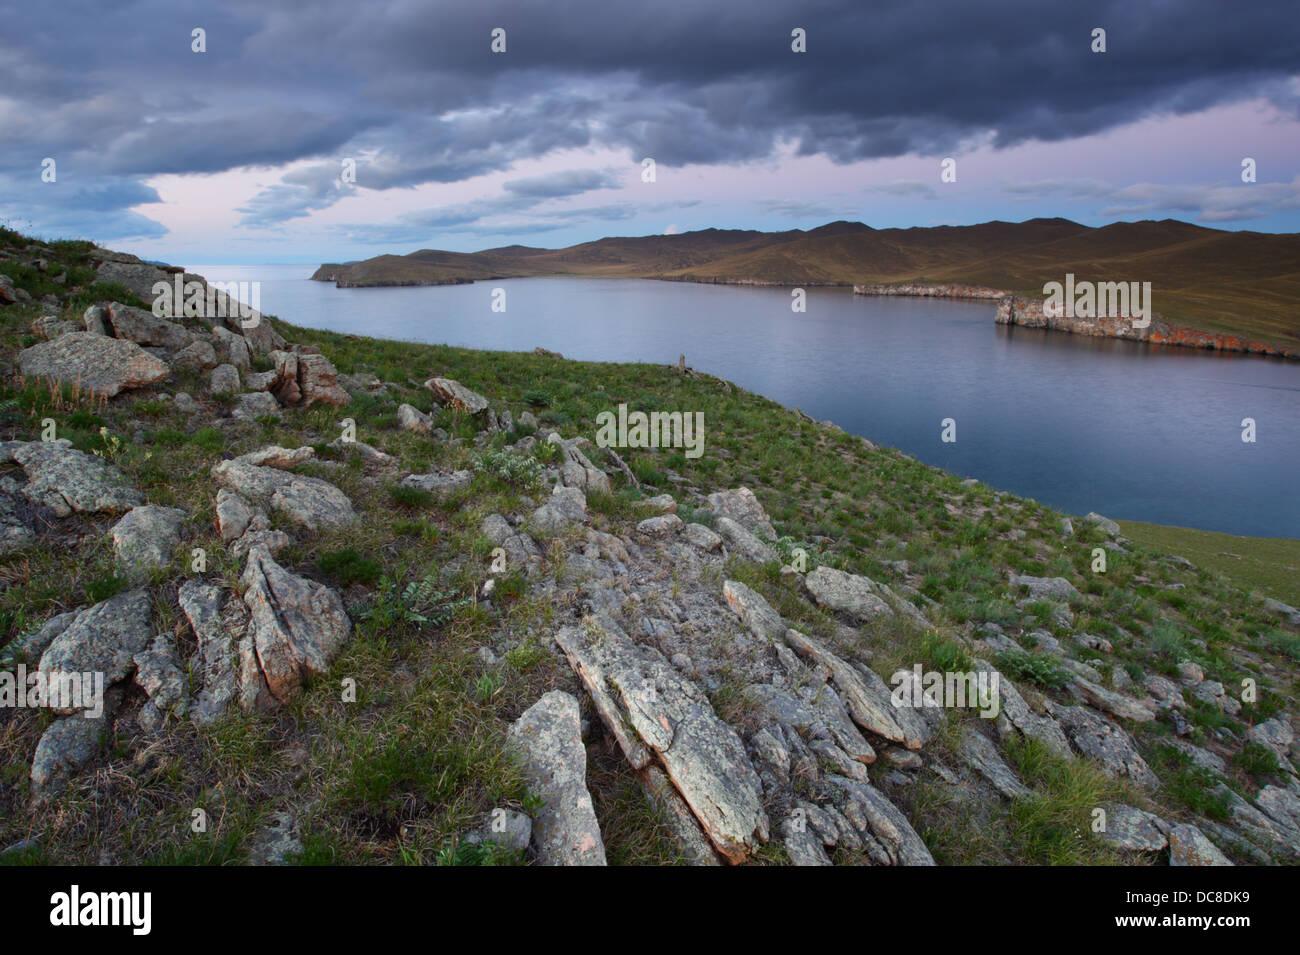 View to the Small Sea (Lake Baikal) from Khibin island. Siberia, Russia - Stock Image